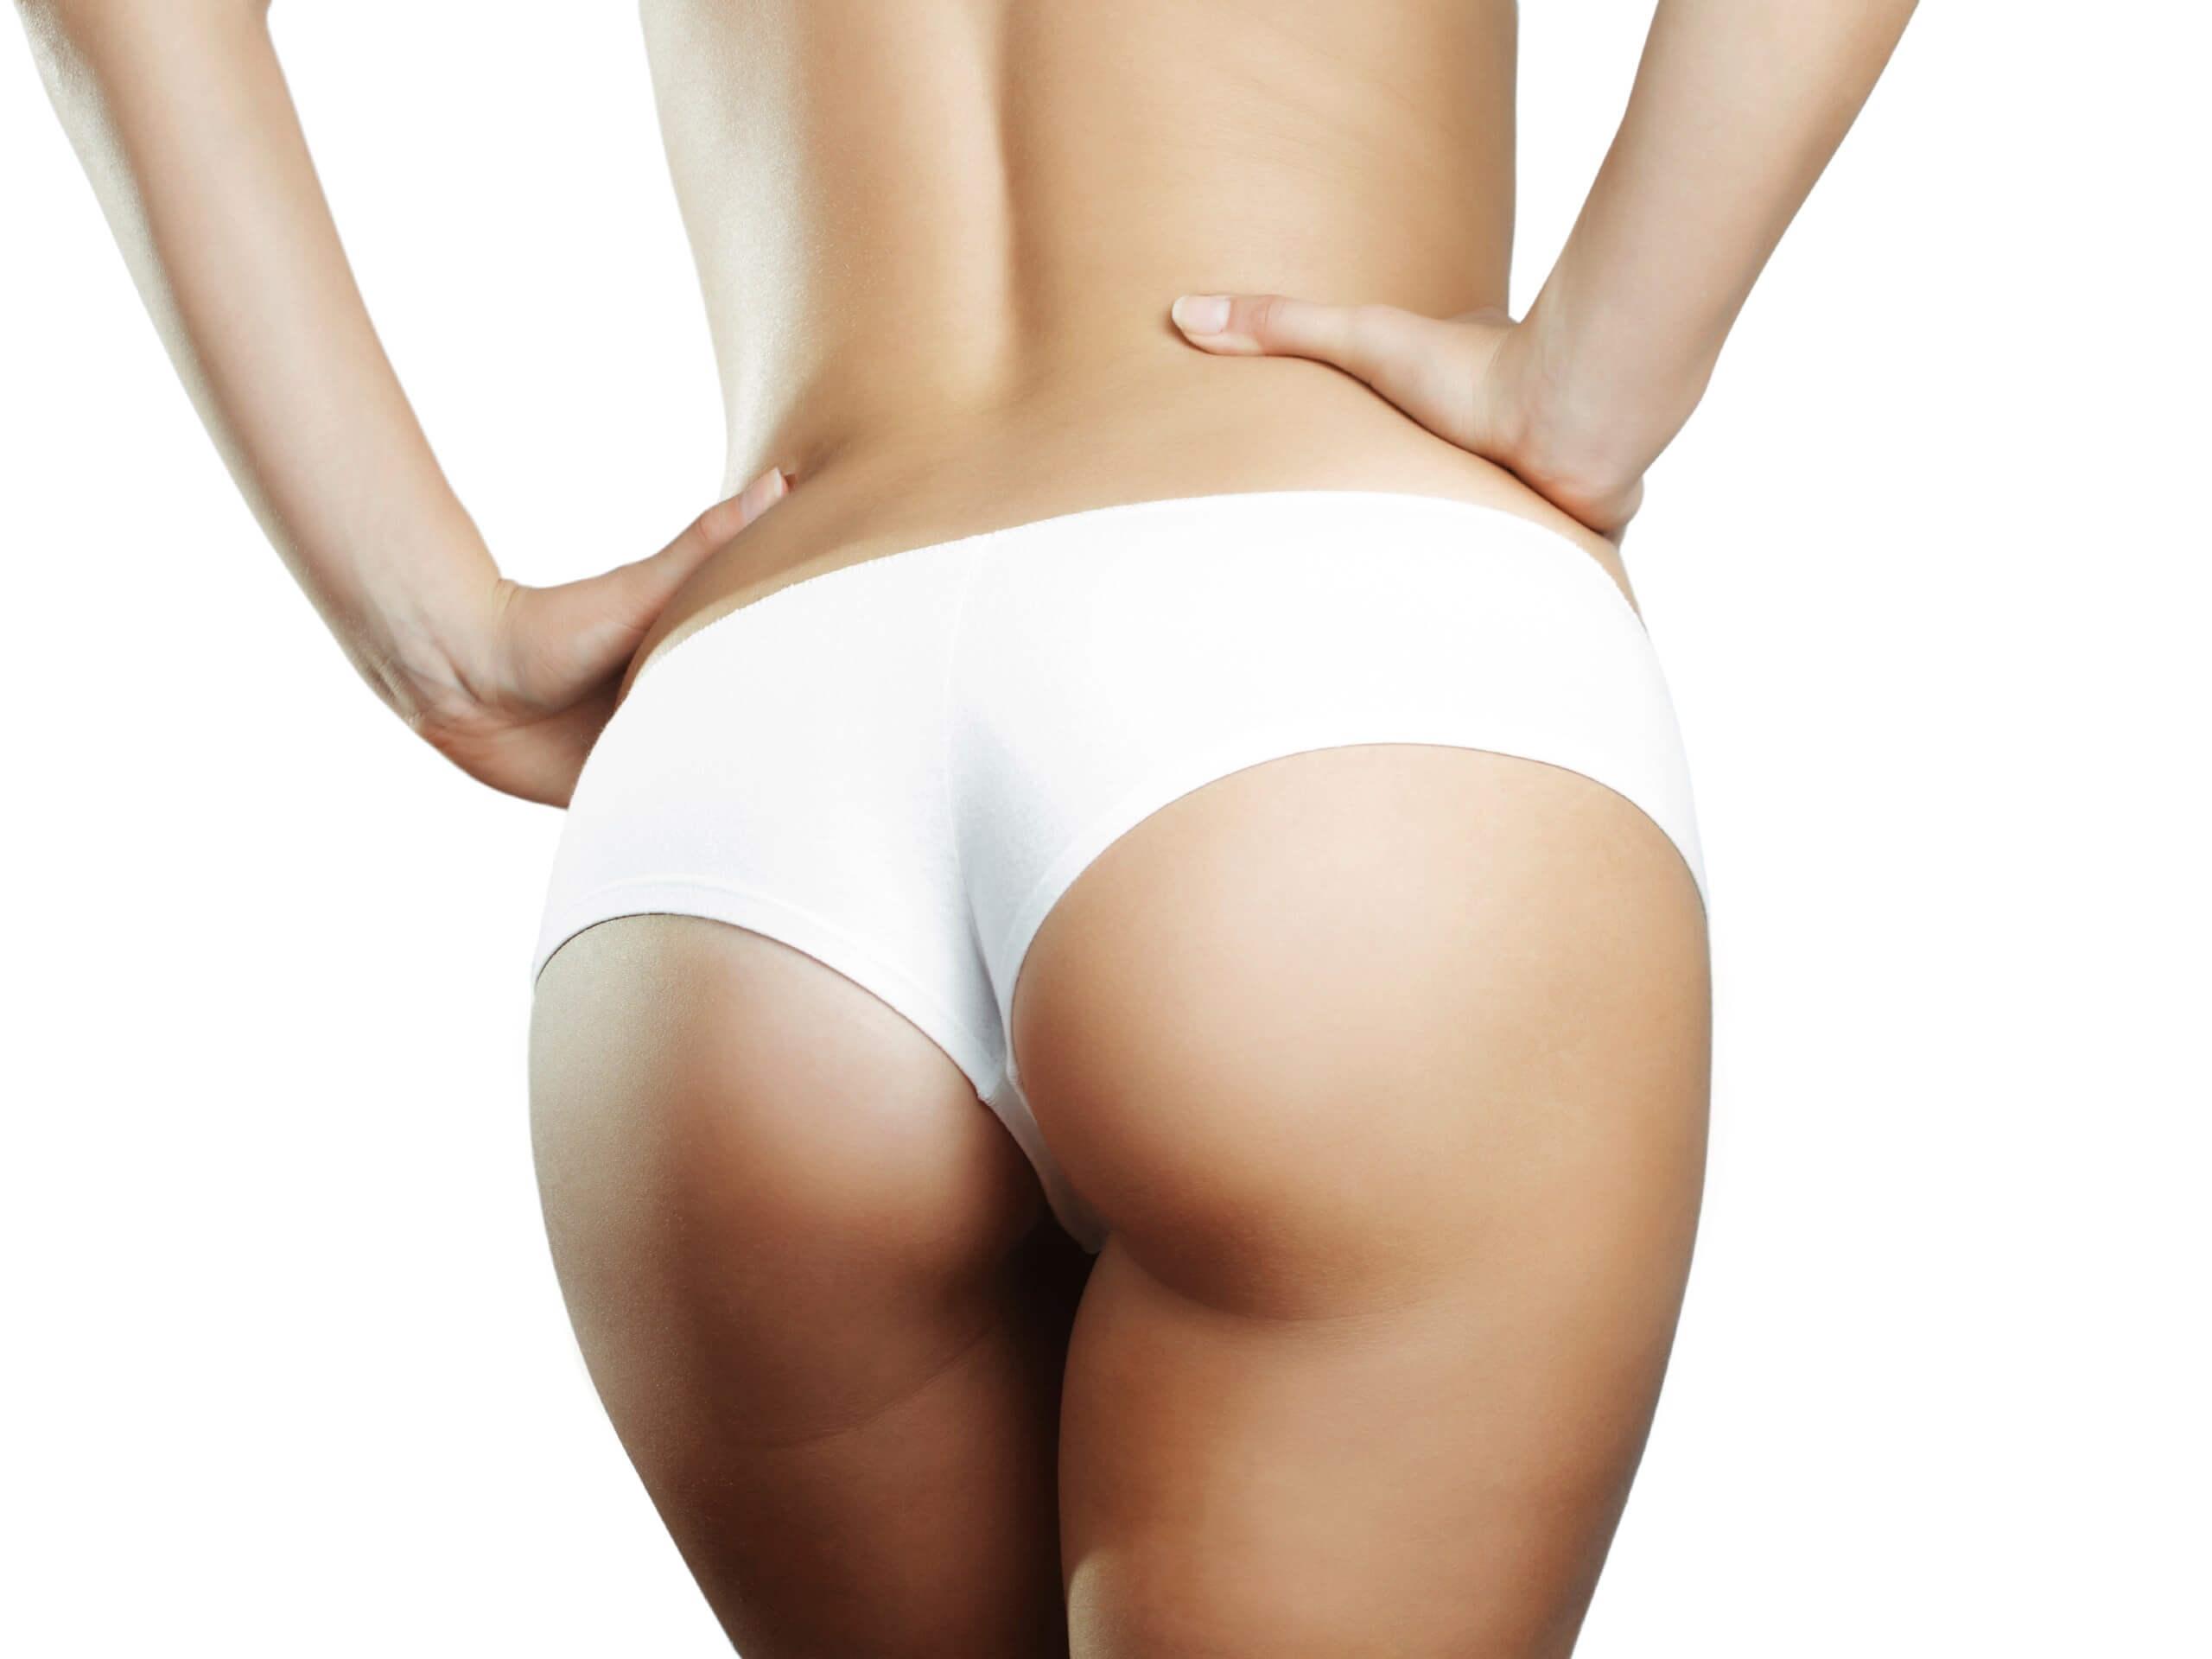 Nonsurgical Butt Augmentation in Las Vegas, NV